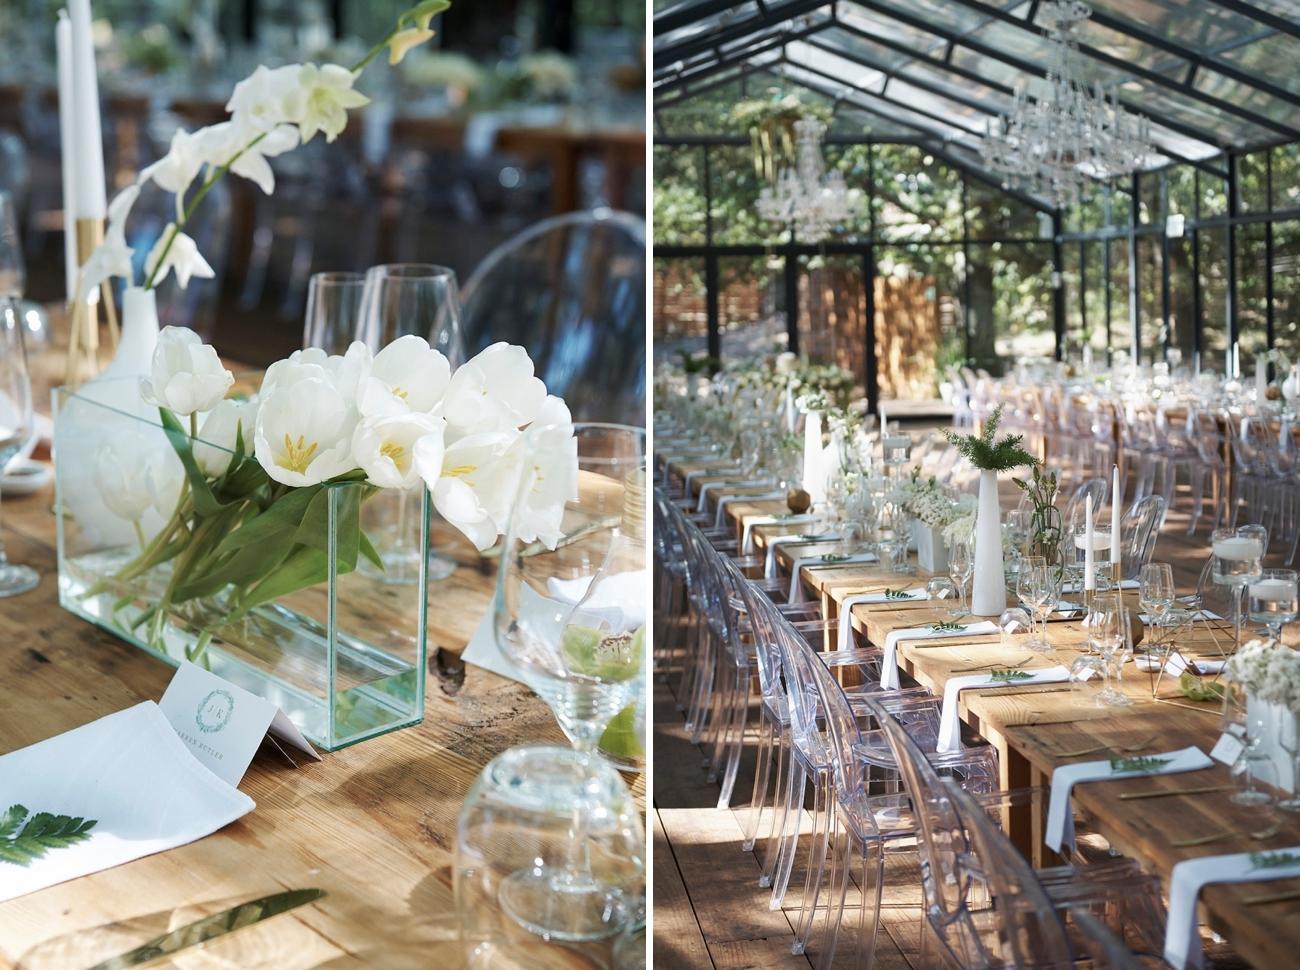 Elegant Rustic Wedding Decor   Image: Knit Together Photography